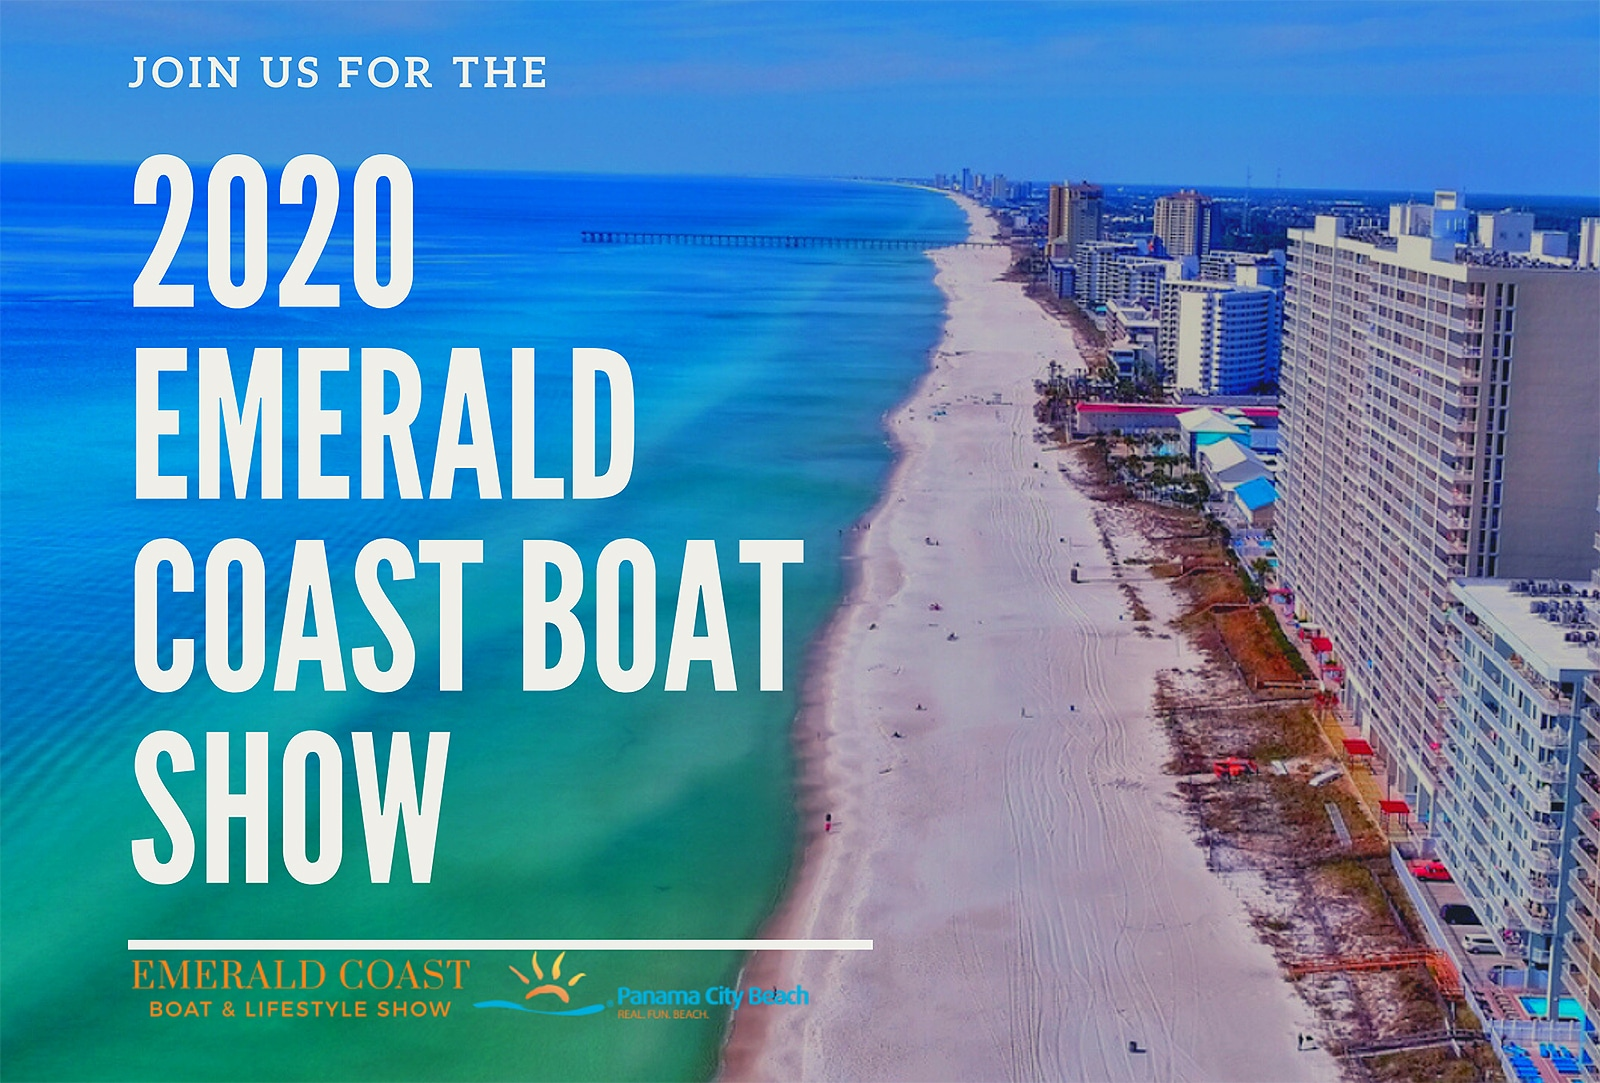 2020 Emerald Coast Boat Show